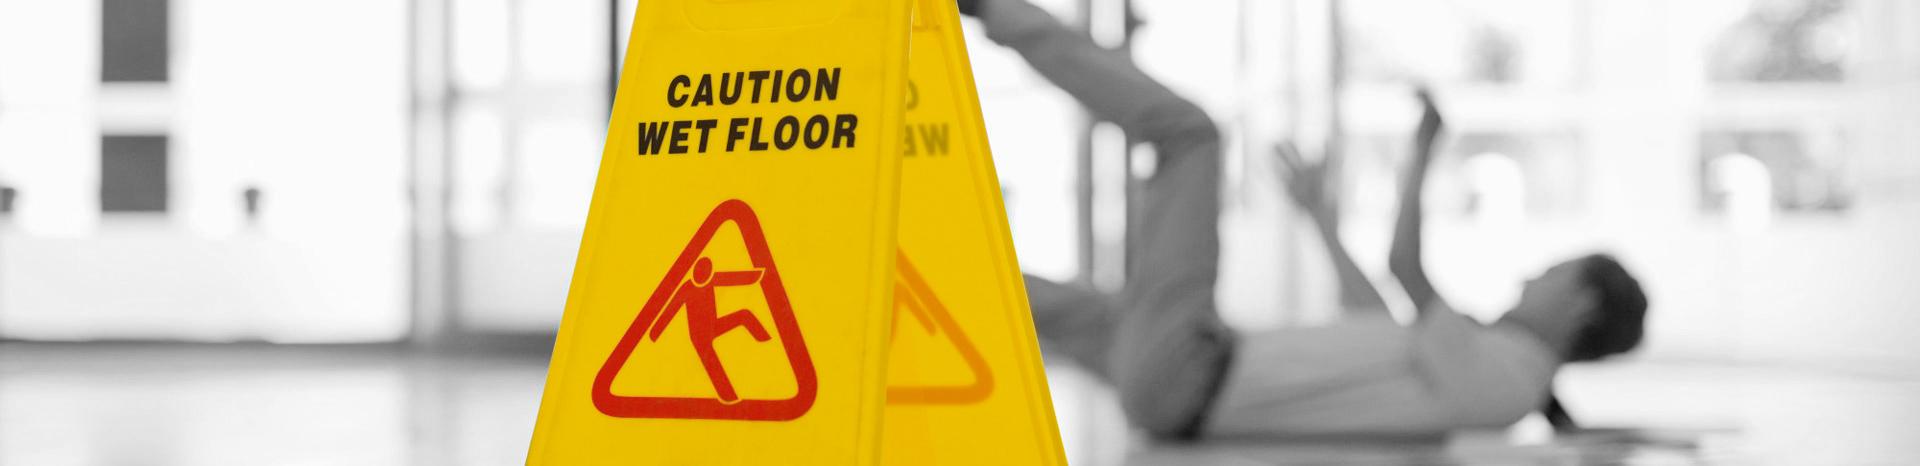 Ongeval op het werk | LetselPro